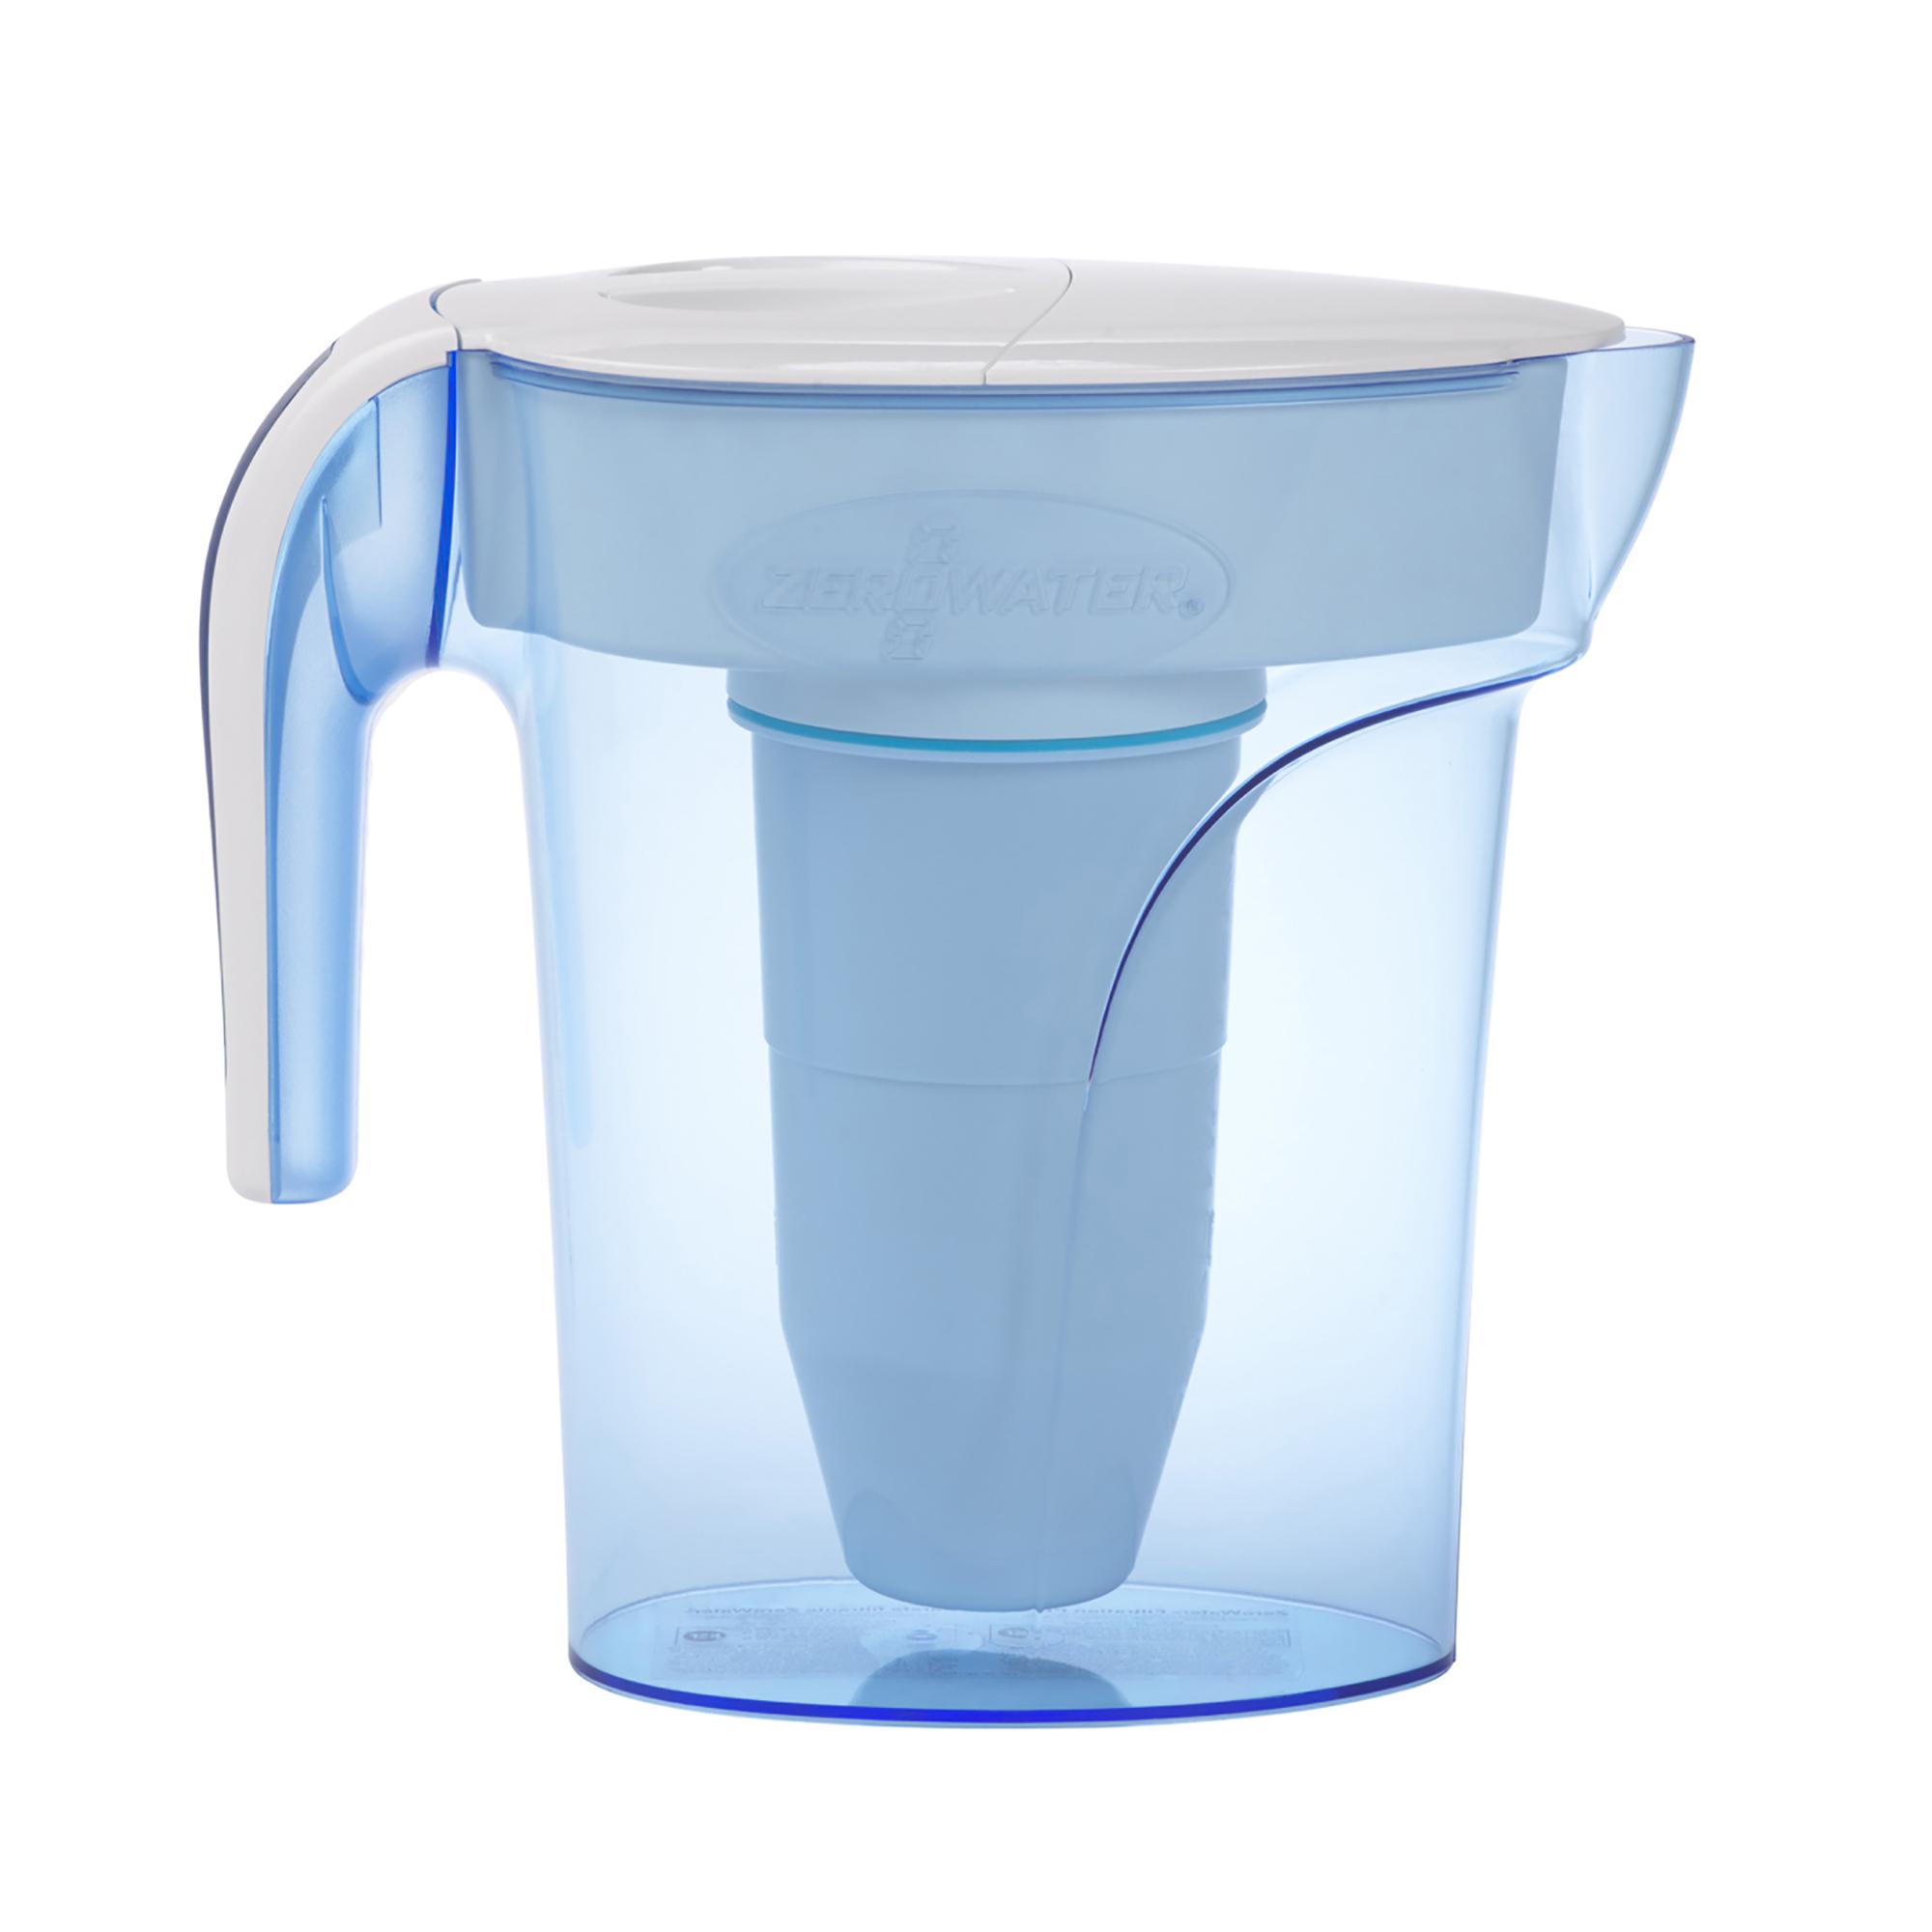 ZeroWater - 1 7-litre water filter jug with TDS meter